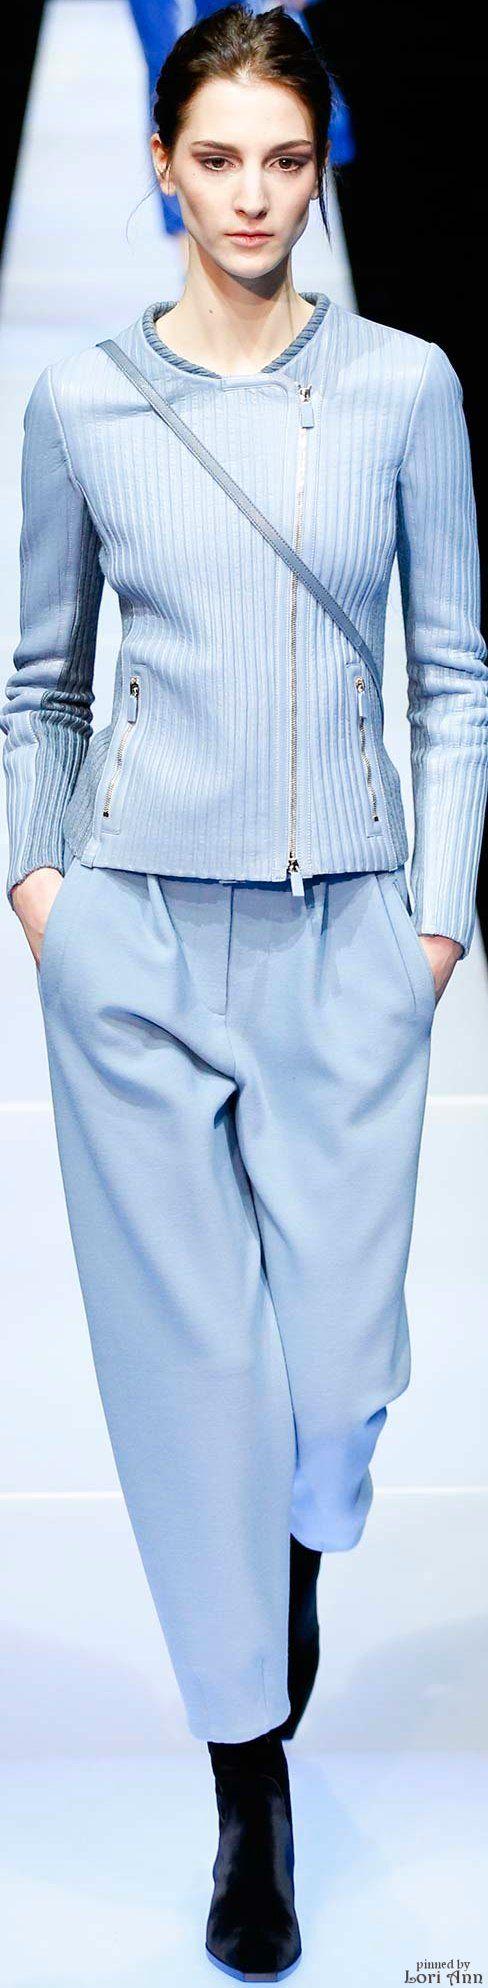 Giorgio Armani ~ Fall Slightly Cropped Jacket w Zipper Closures  Soft Blue 2015